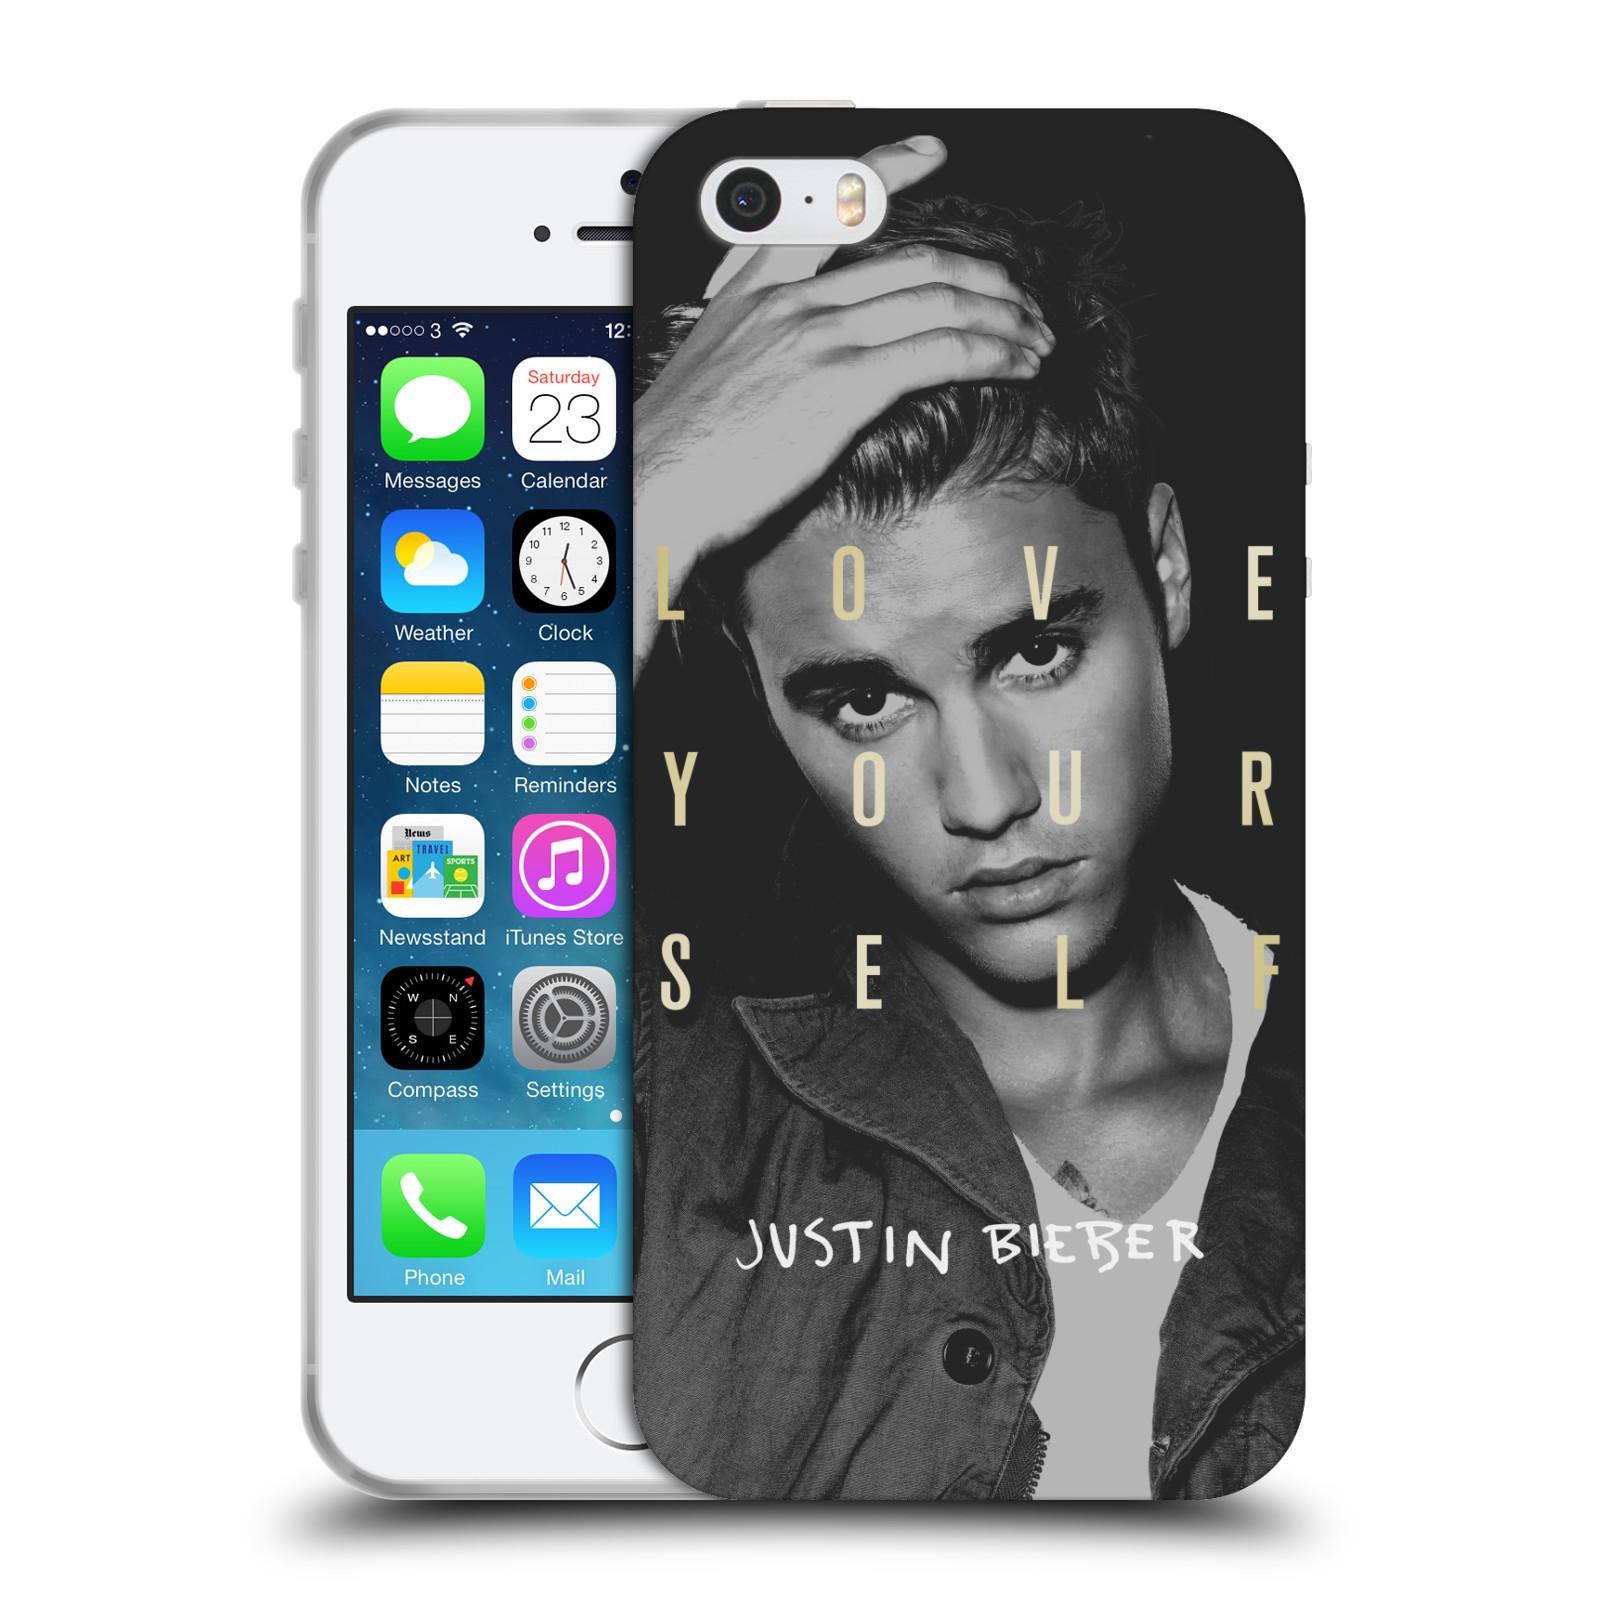 HEAD CASE silikonový obal na mobil Apple Iphone 5 / 5S originální potisk Justin Bieber foto text